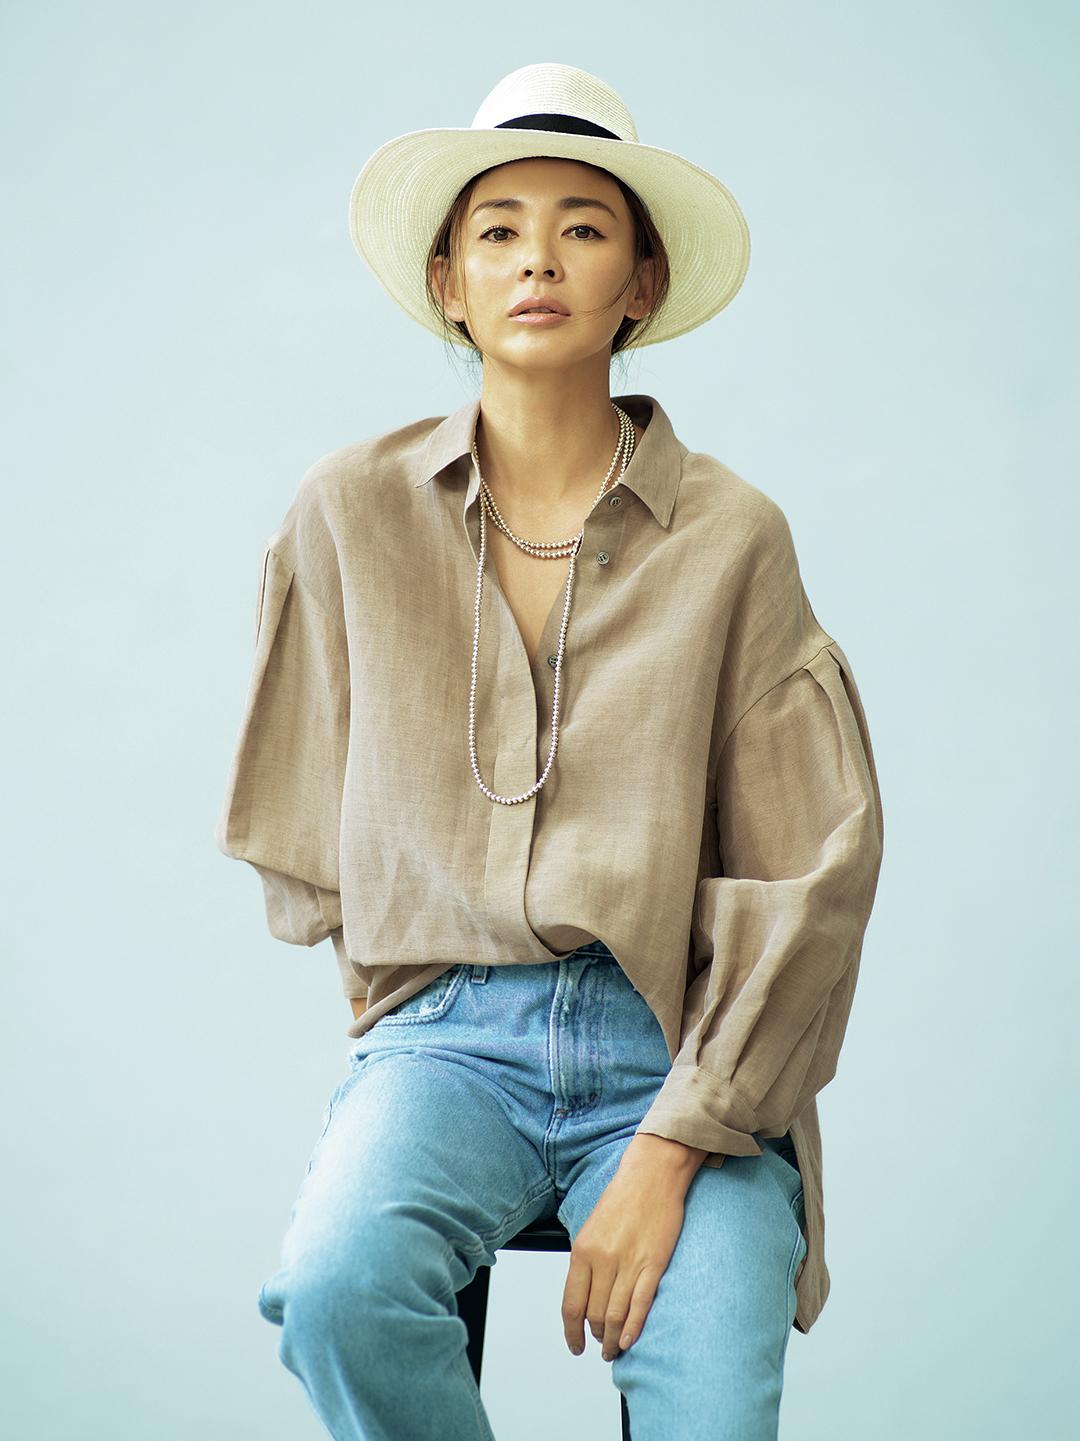 SHIHOが着るebureの自然体で着映える服_4